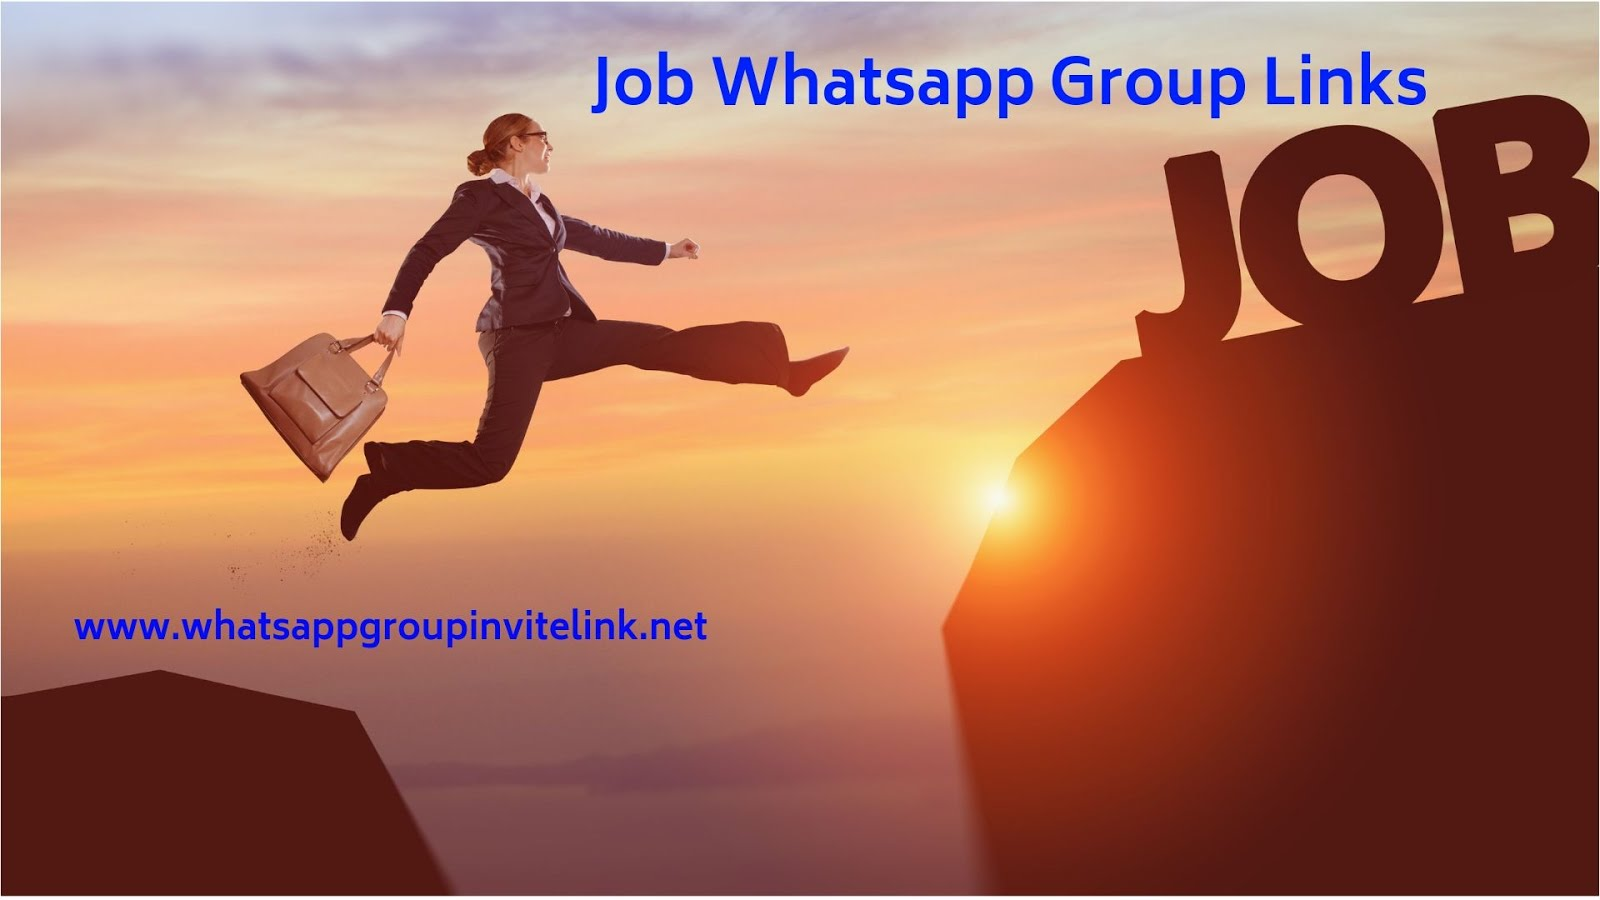 Whatsapp Group Invite Links: Job Whatsapp Group Links